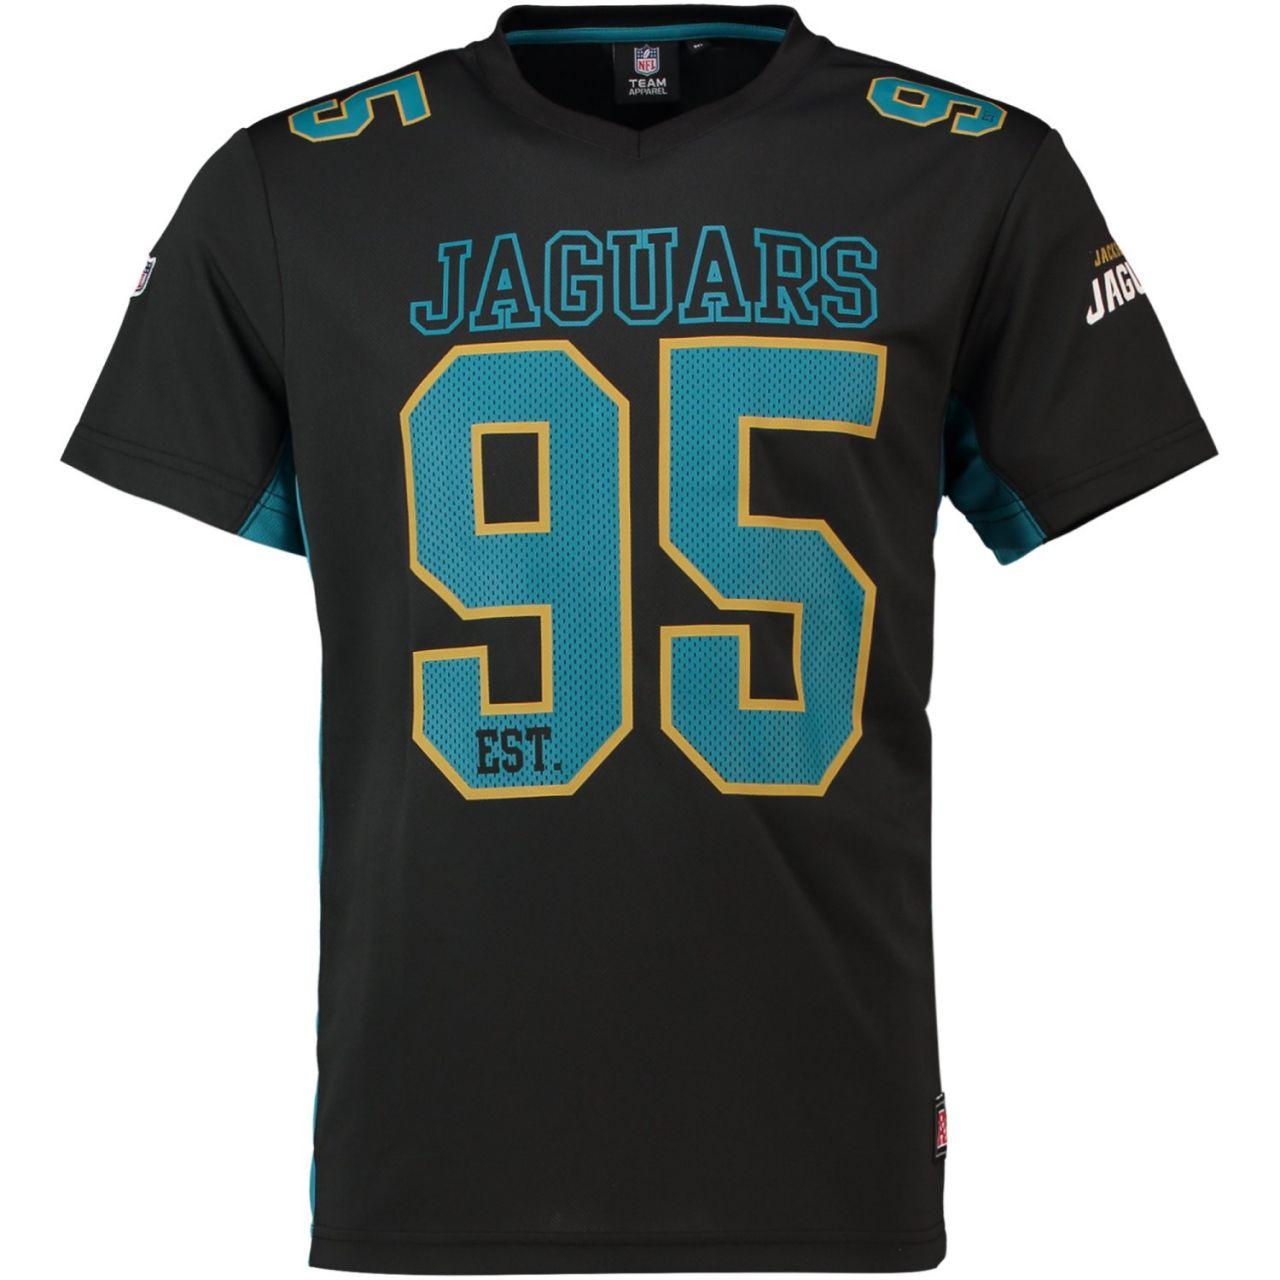 amfoo - Majestic NFL Polymesh Jersey Shirt - Jacksonville Jaguars